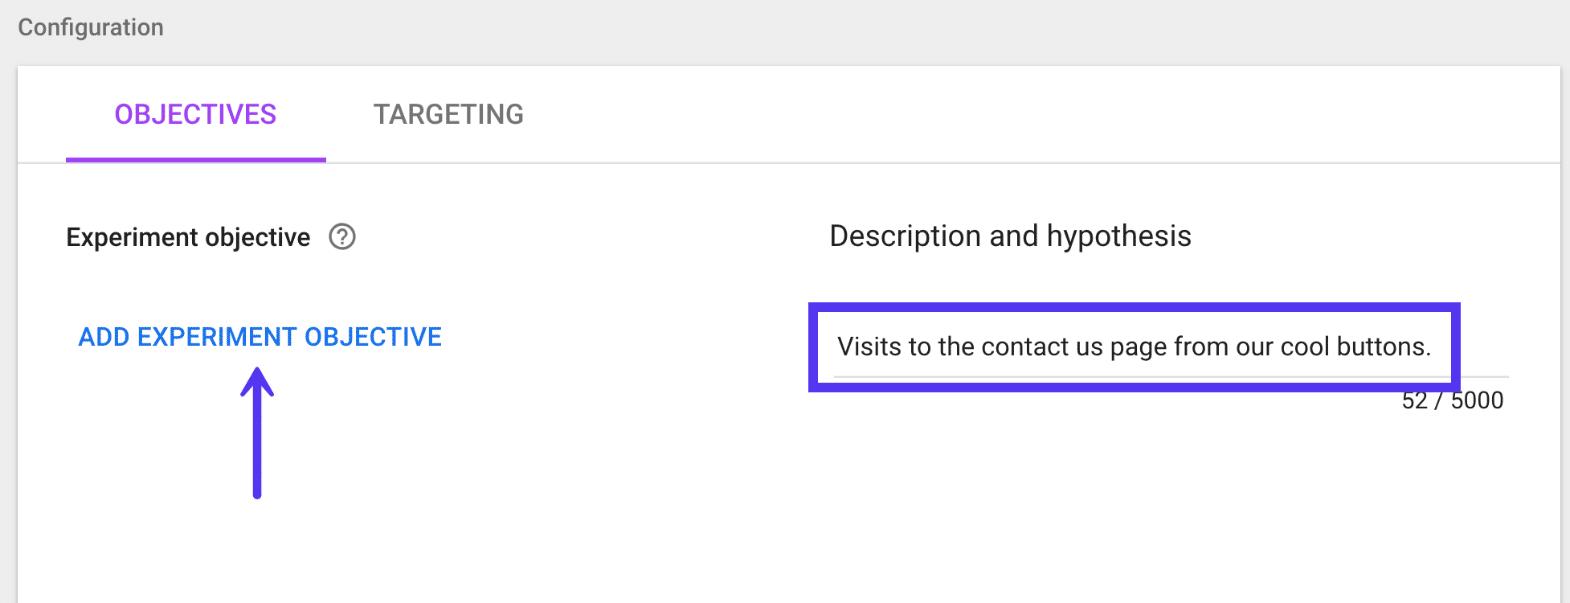 Как провести A/B-тестирование сайта на WordPress с помощью Google Optimize